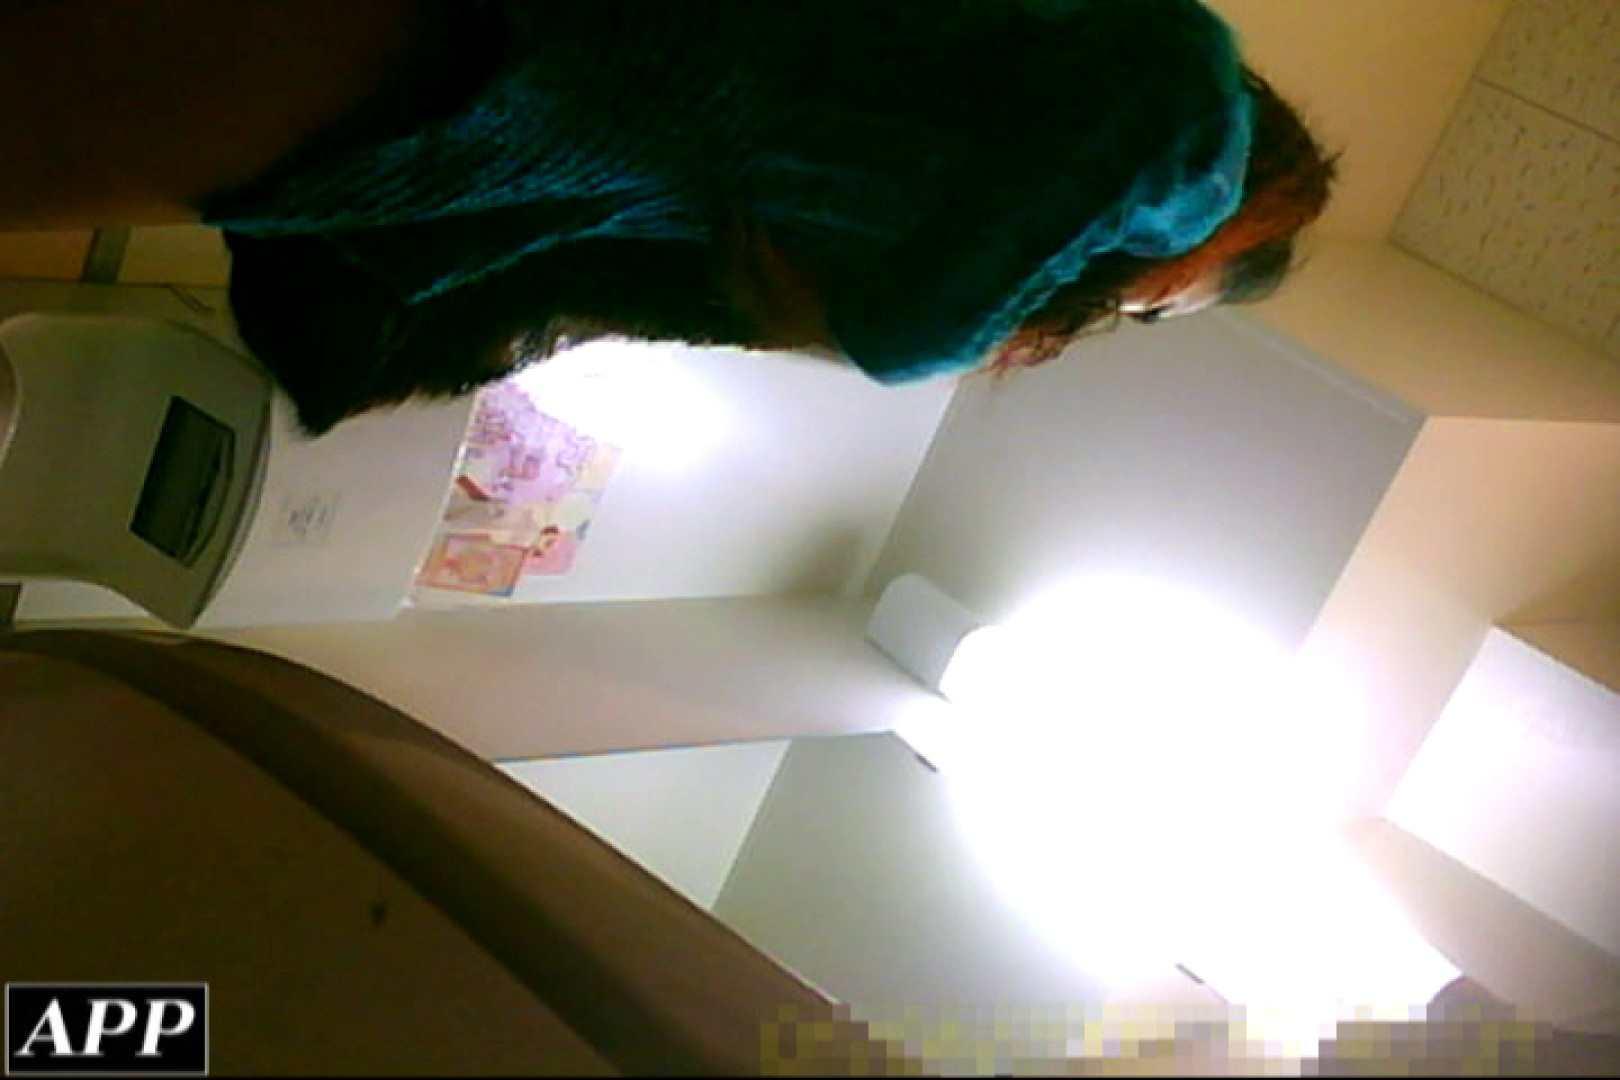 3視点洗面所 vol.004 OLエロ画像  107PICs 54